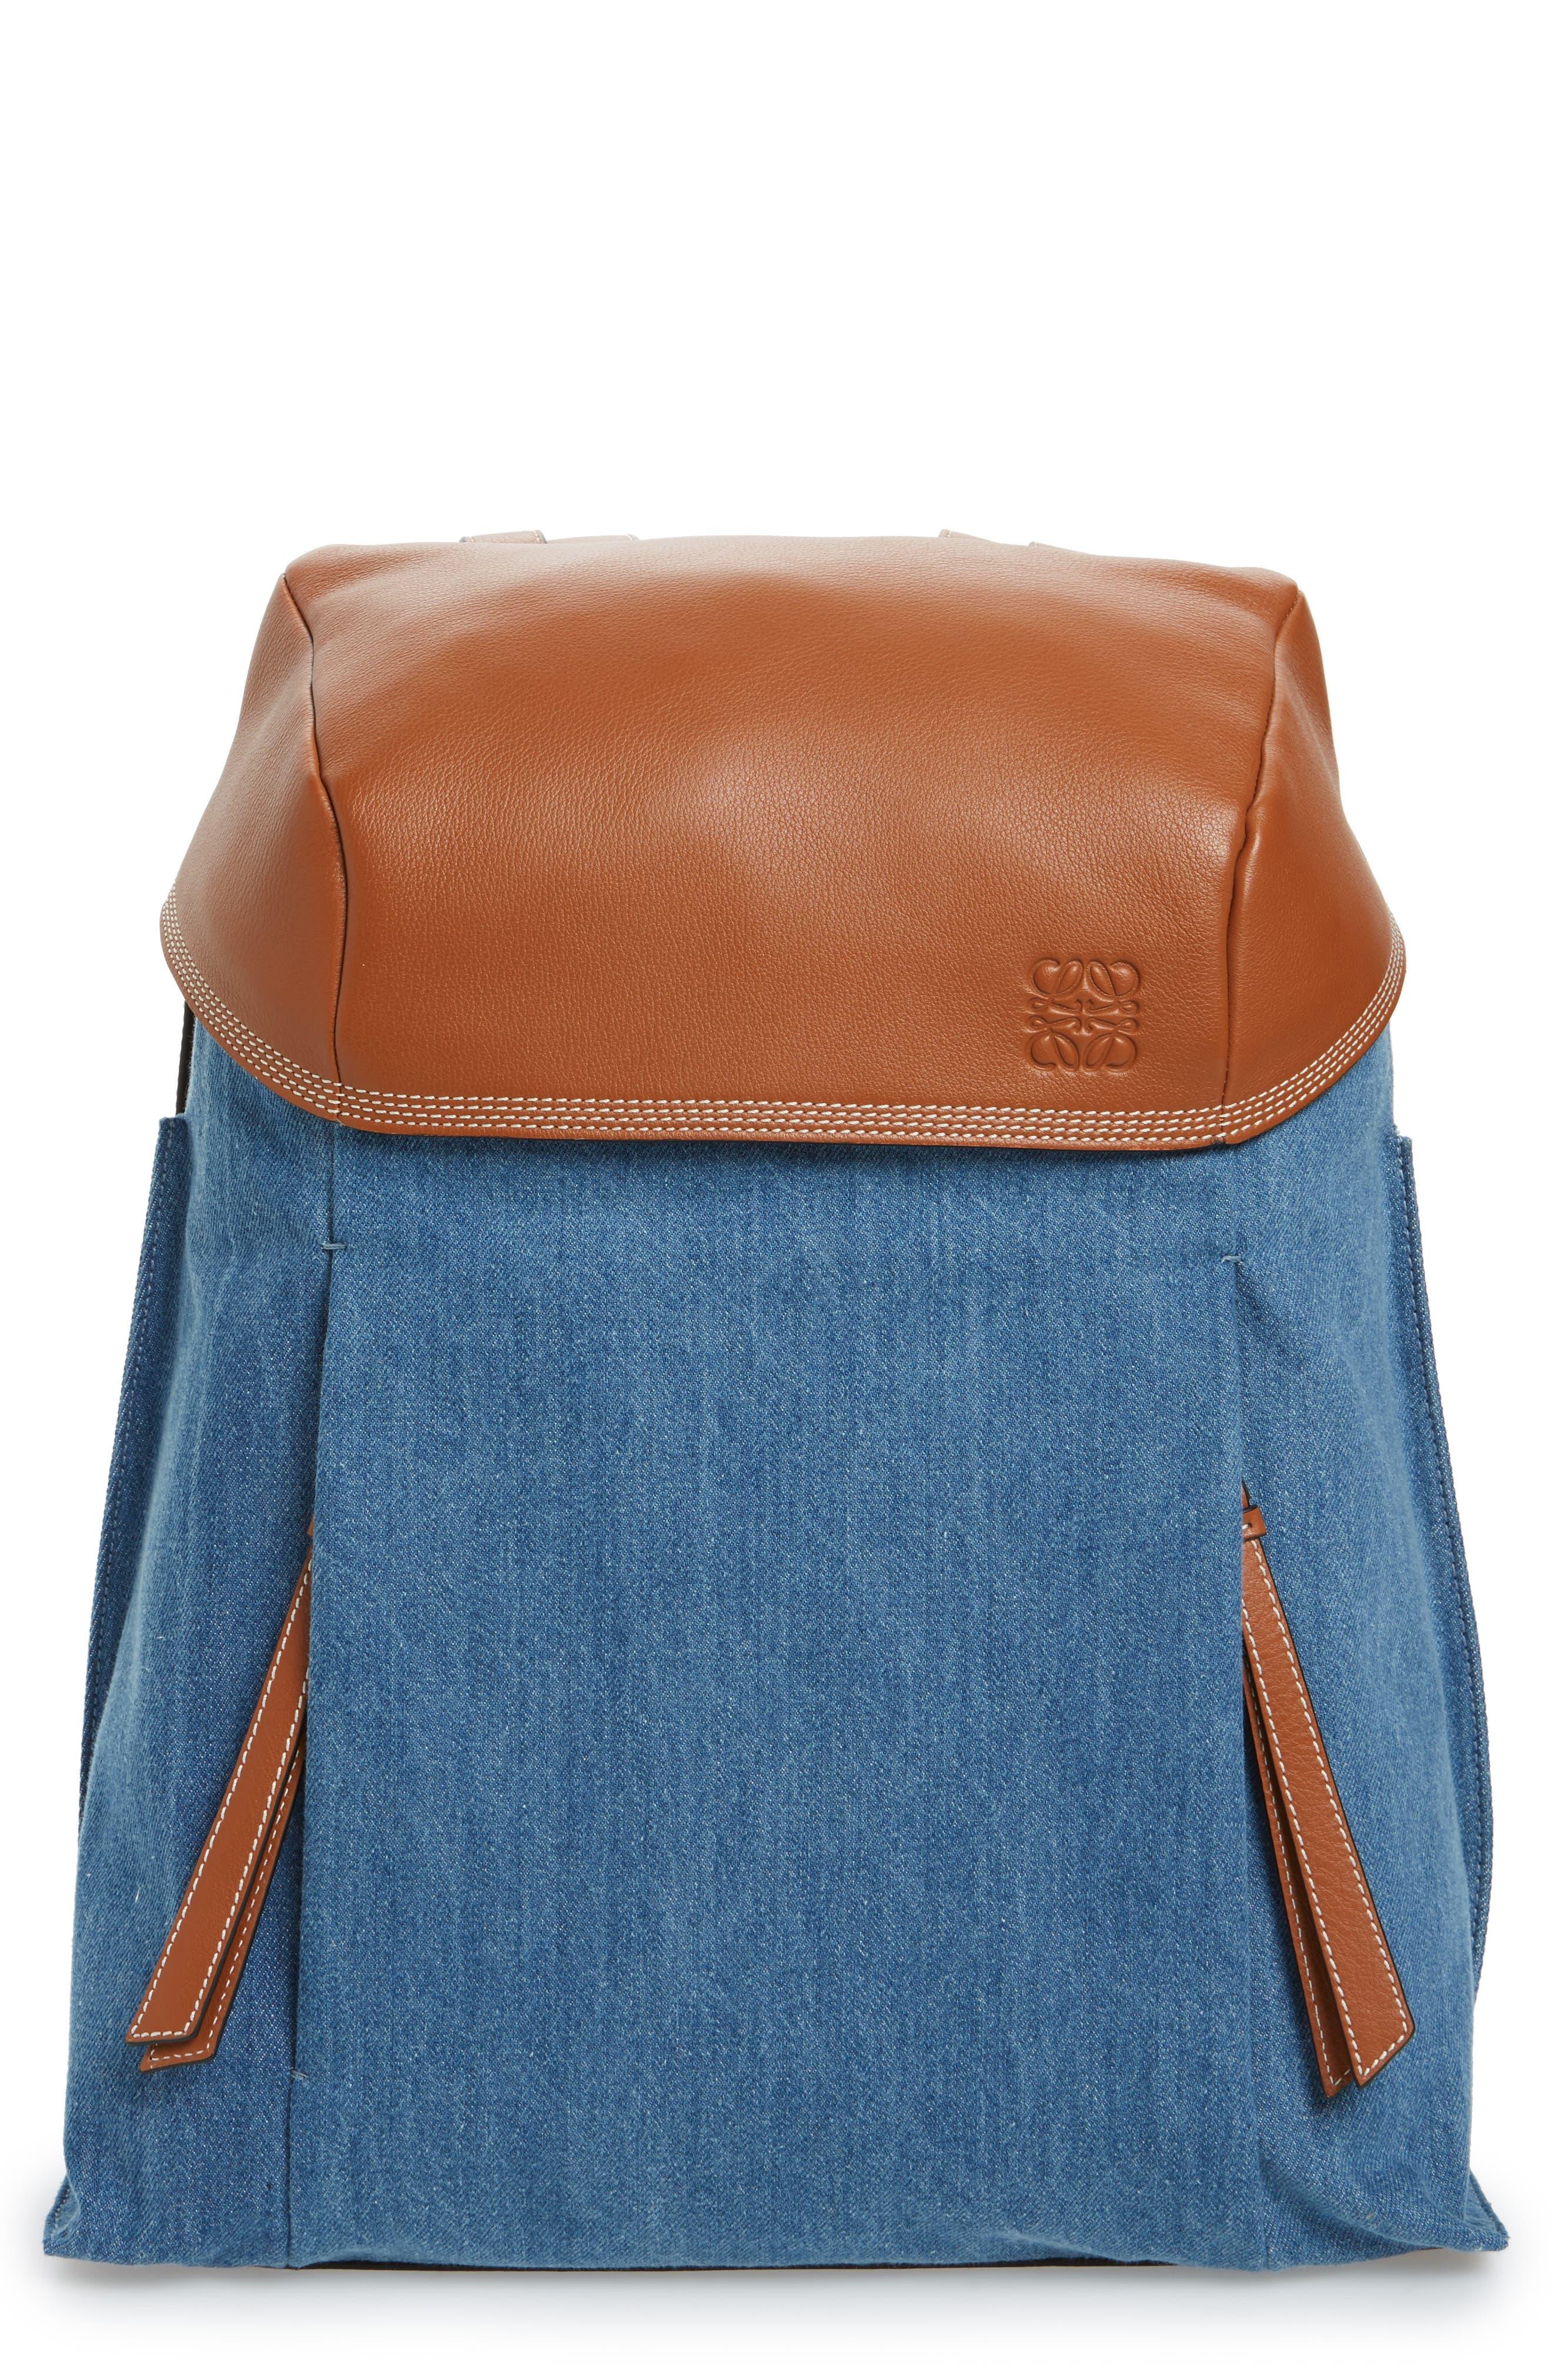 Alternate Image 1 Selected - Loewe T Small Denim & Leather Backpack